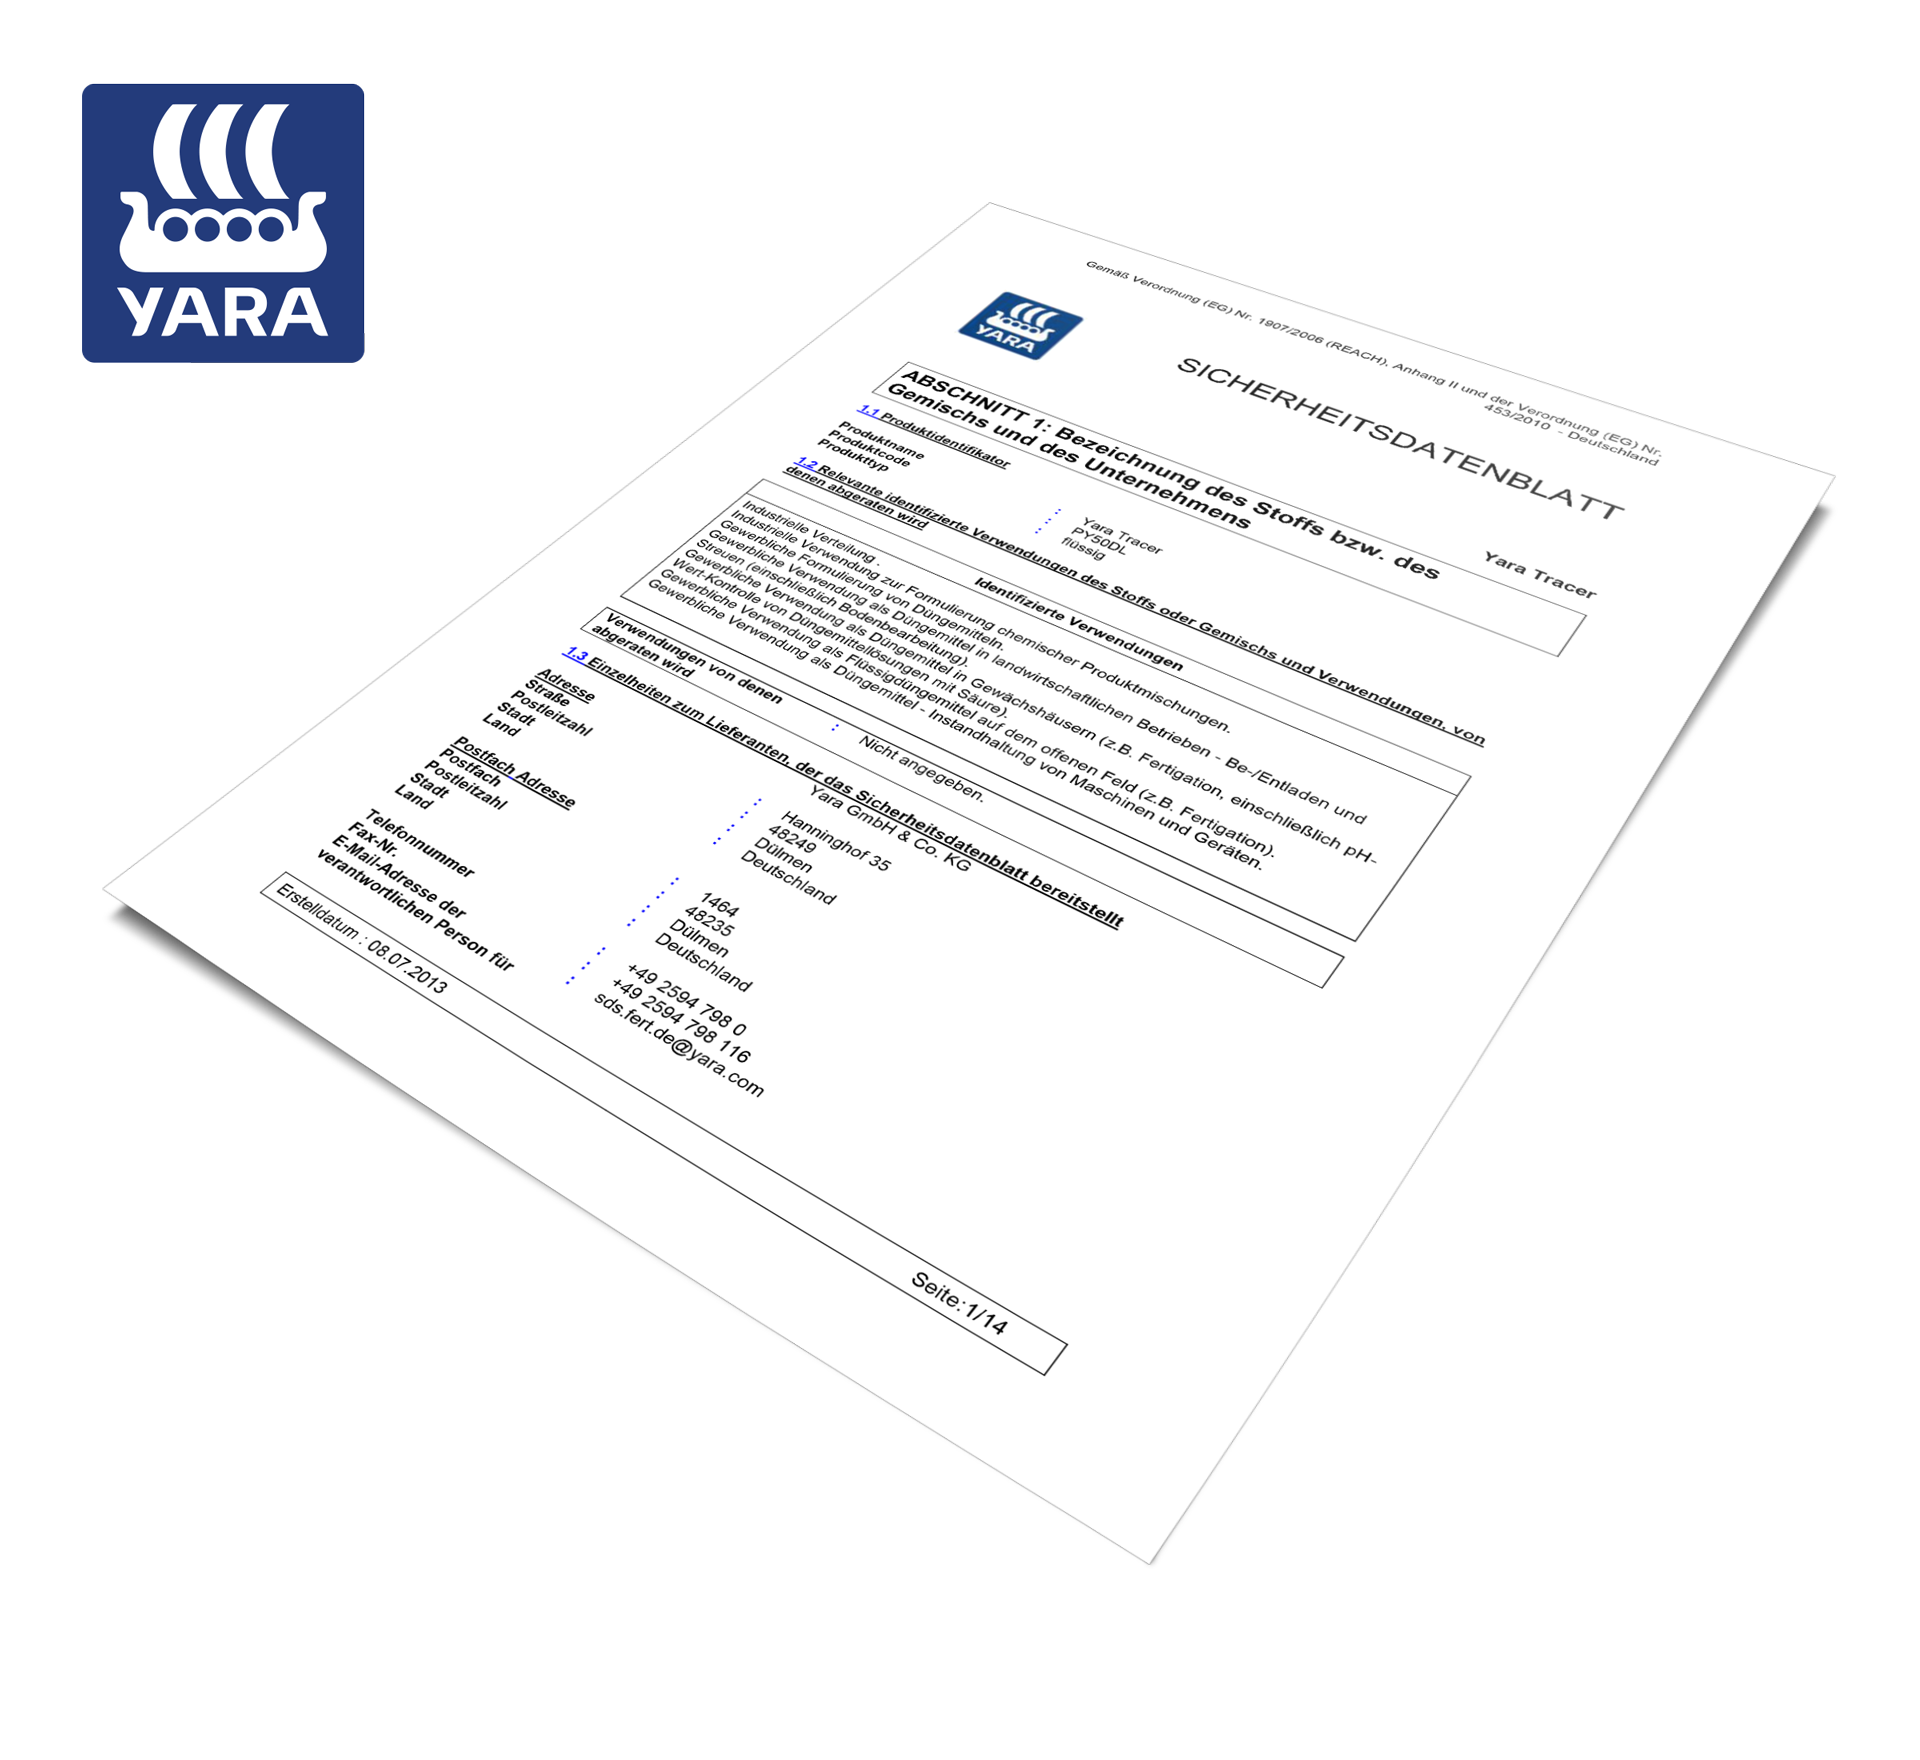 YaraVita-Tracer_Sicherheitsdatenblatt